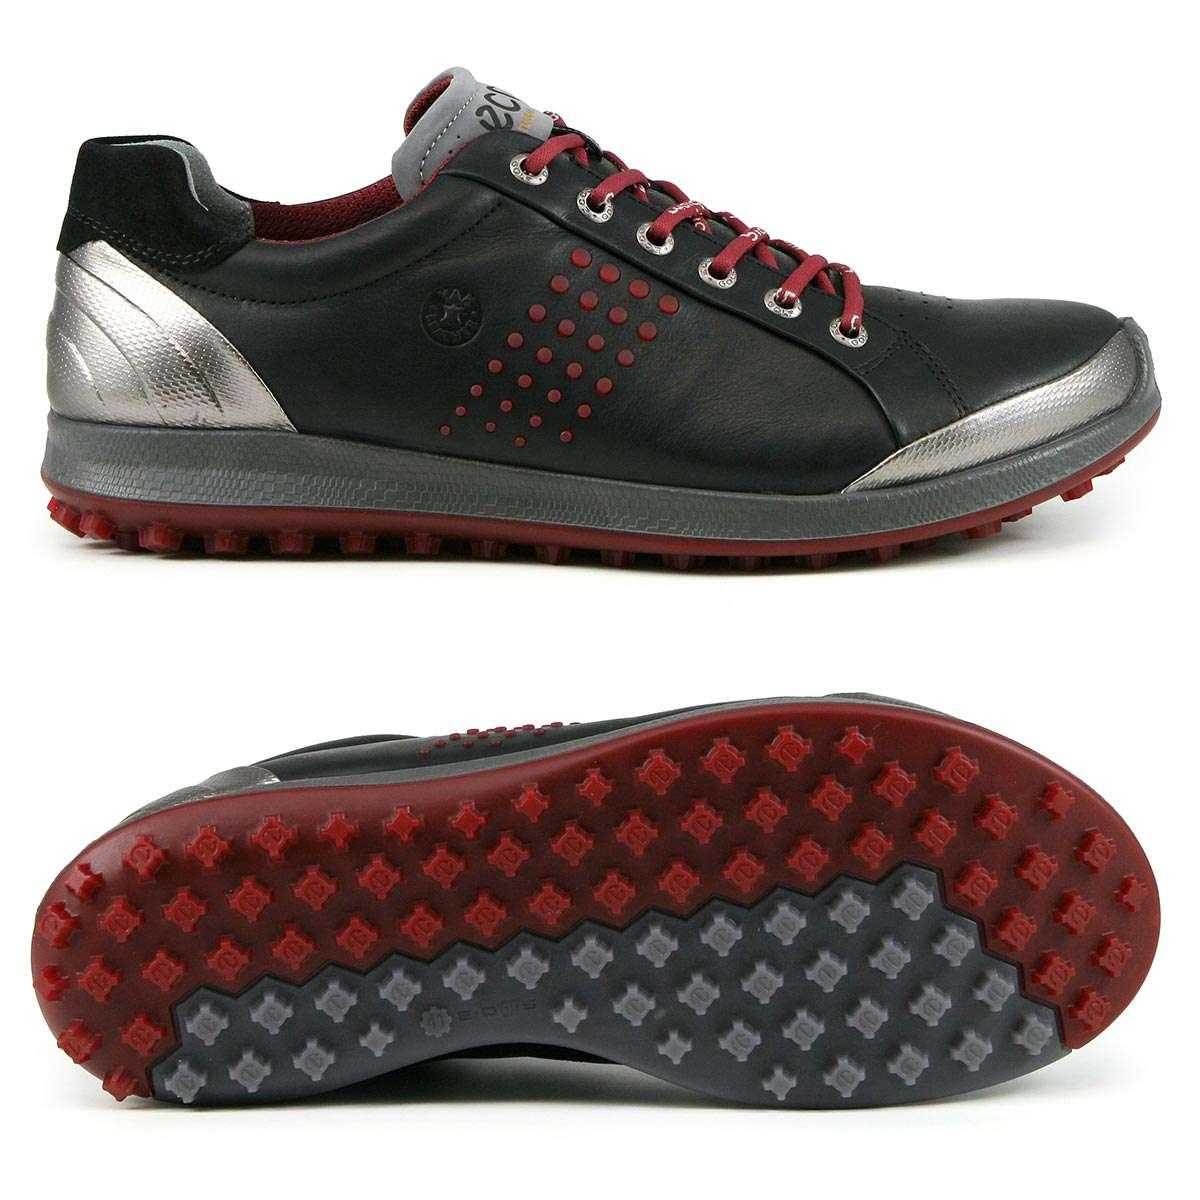 cute cheap outlet boutique aliexpress Ecco Biom Hybrid 2 Herren Golf Schuhe, Schwarz / Grau